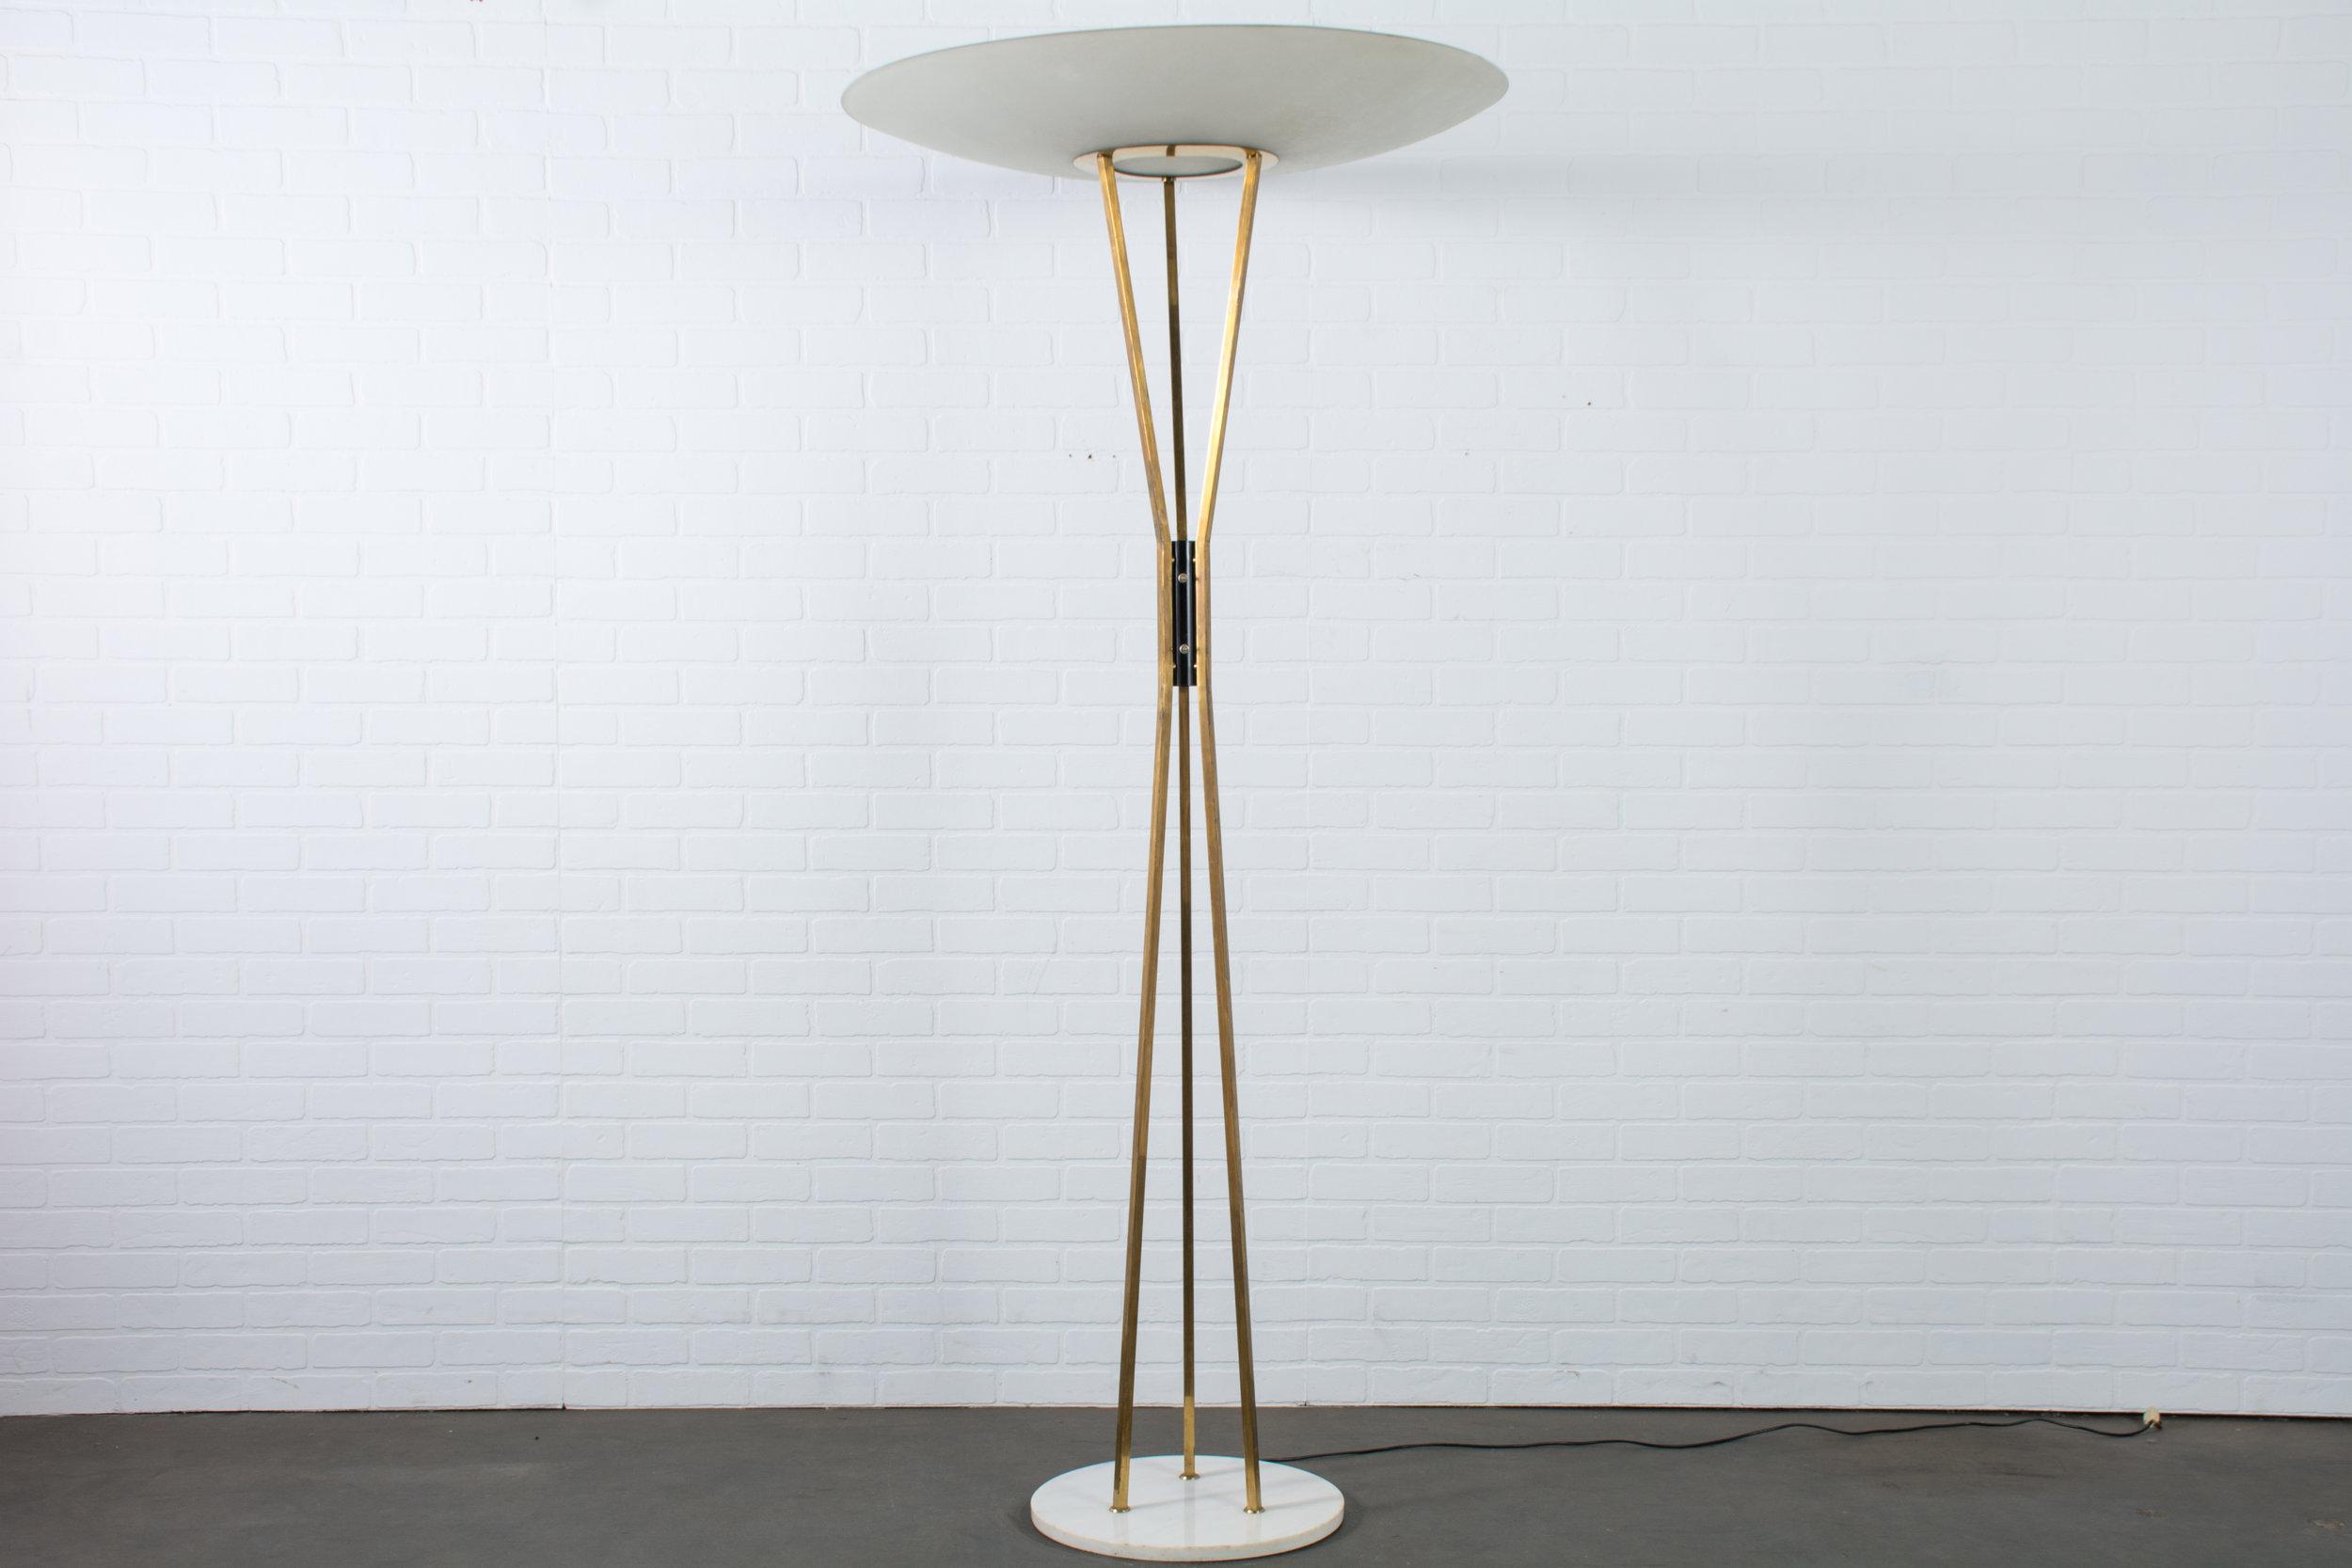 Gaetano Sciolari For Stilnovo Large Brass Floor Lamp Italy 1950s Mid Century Modern Finds